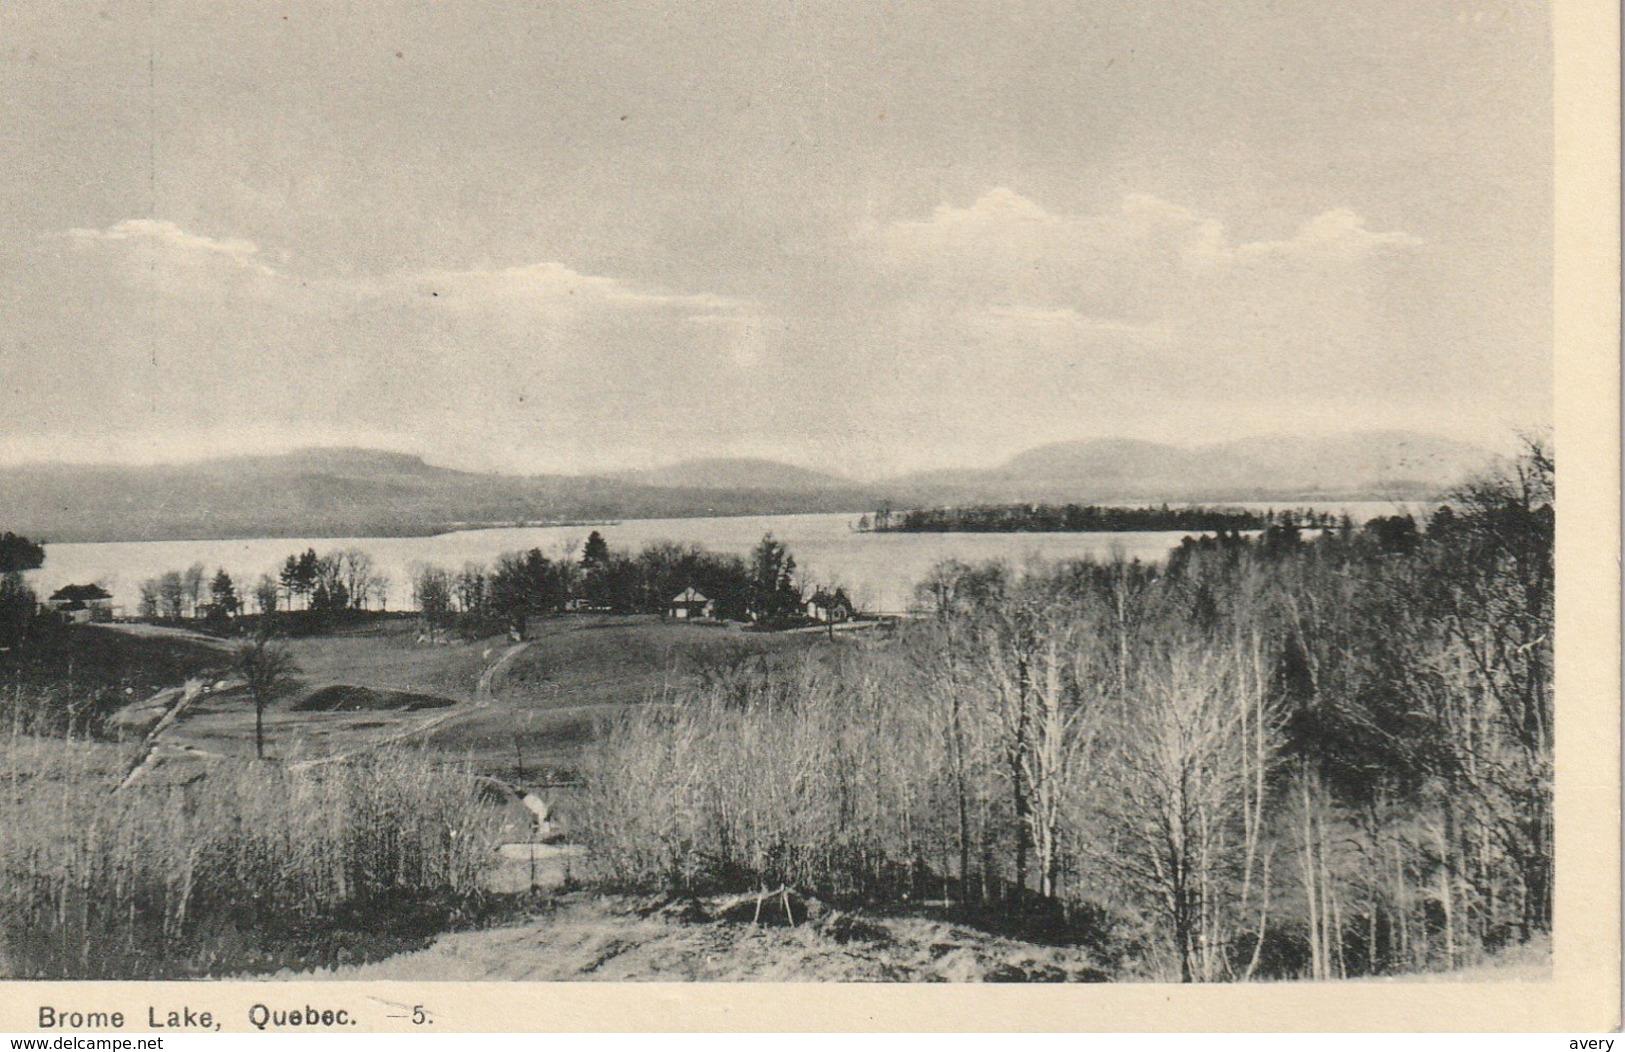 Lac Brome, Quebec Brome Lake - Quebec